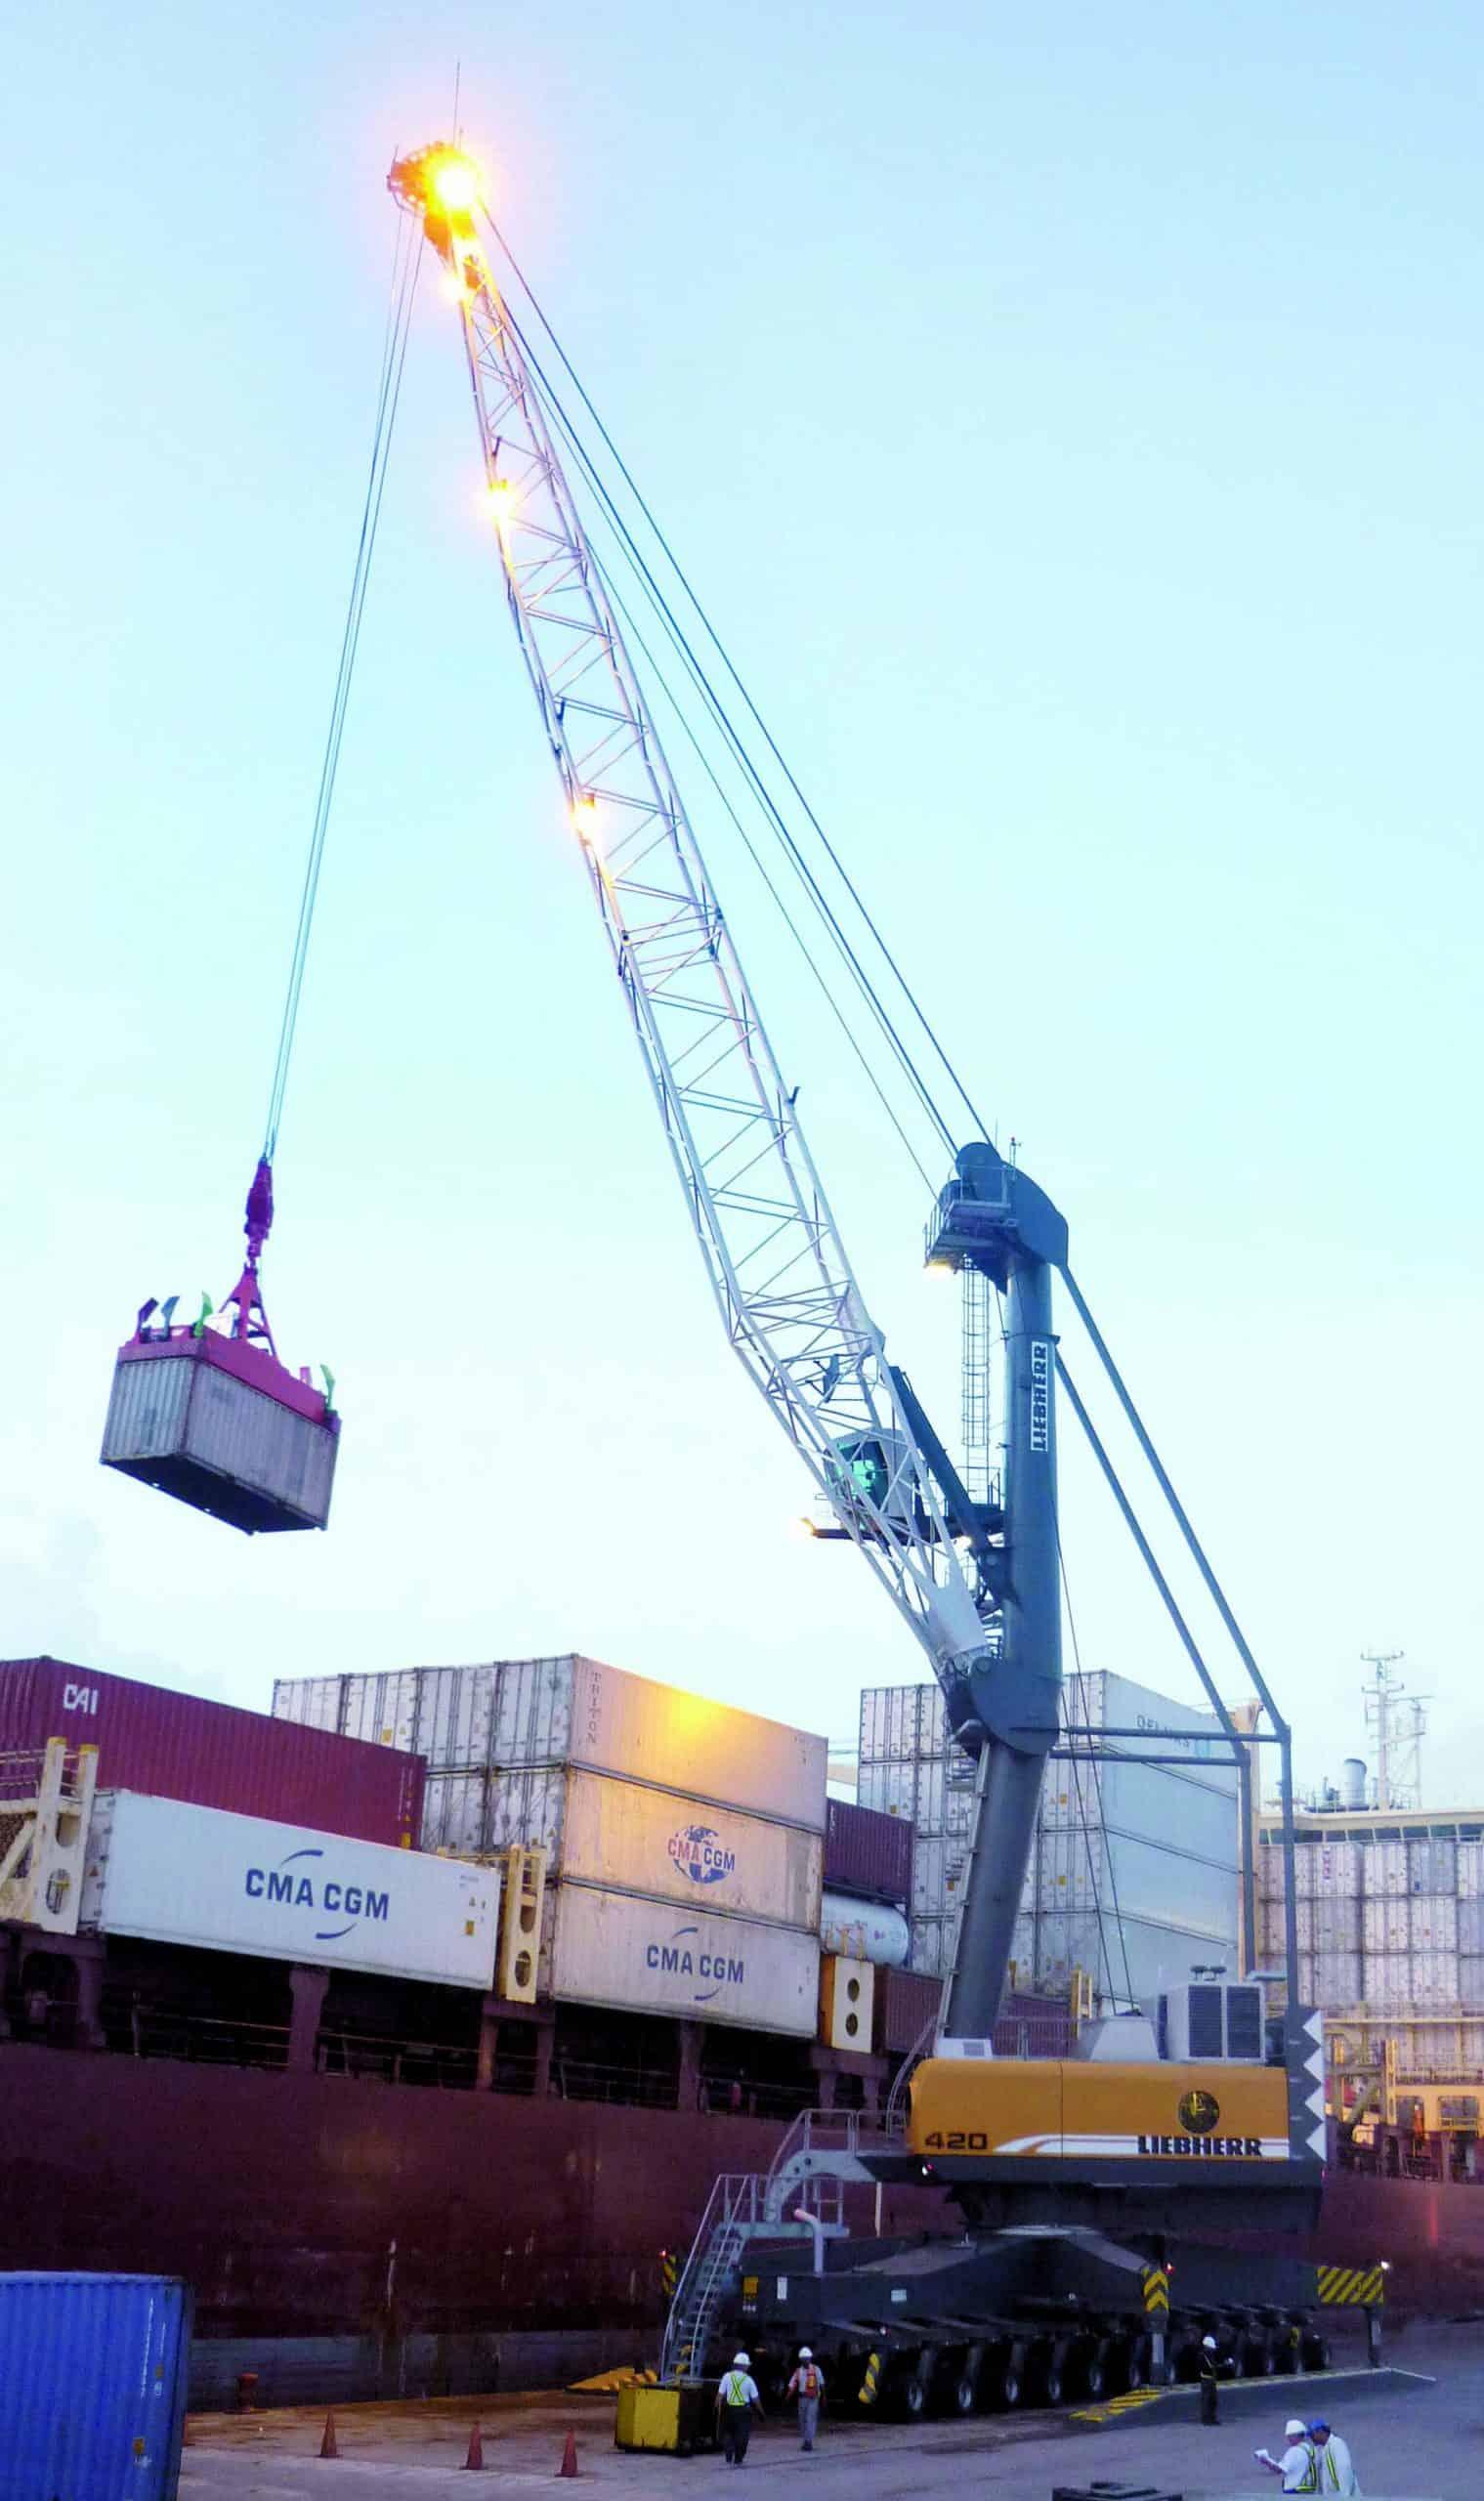 Liebherr mobile harbour crane bound for Australia